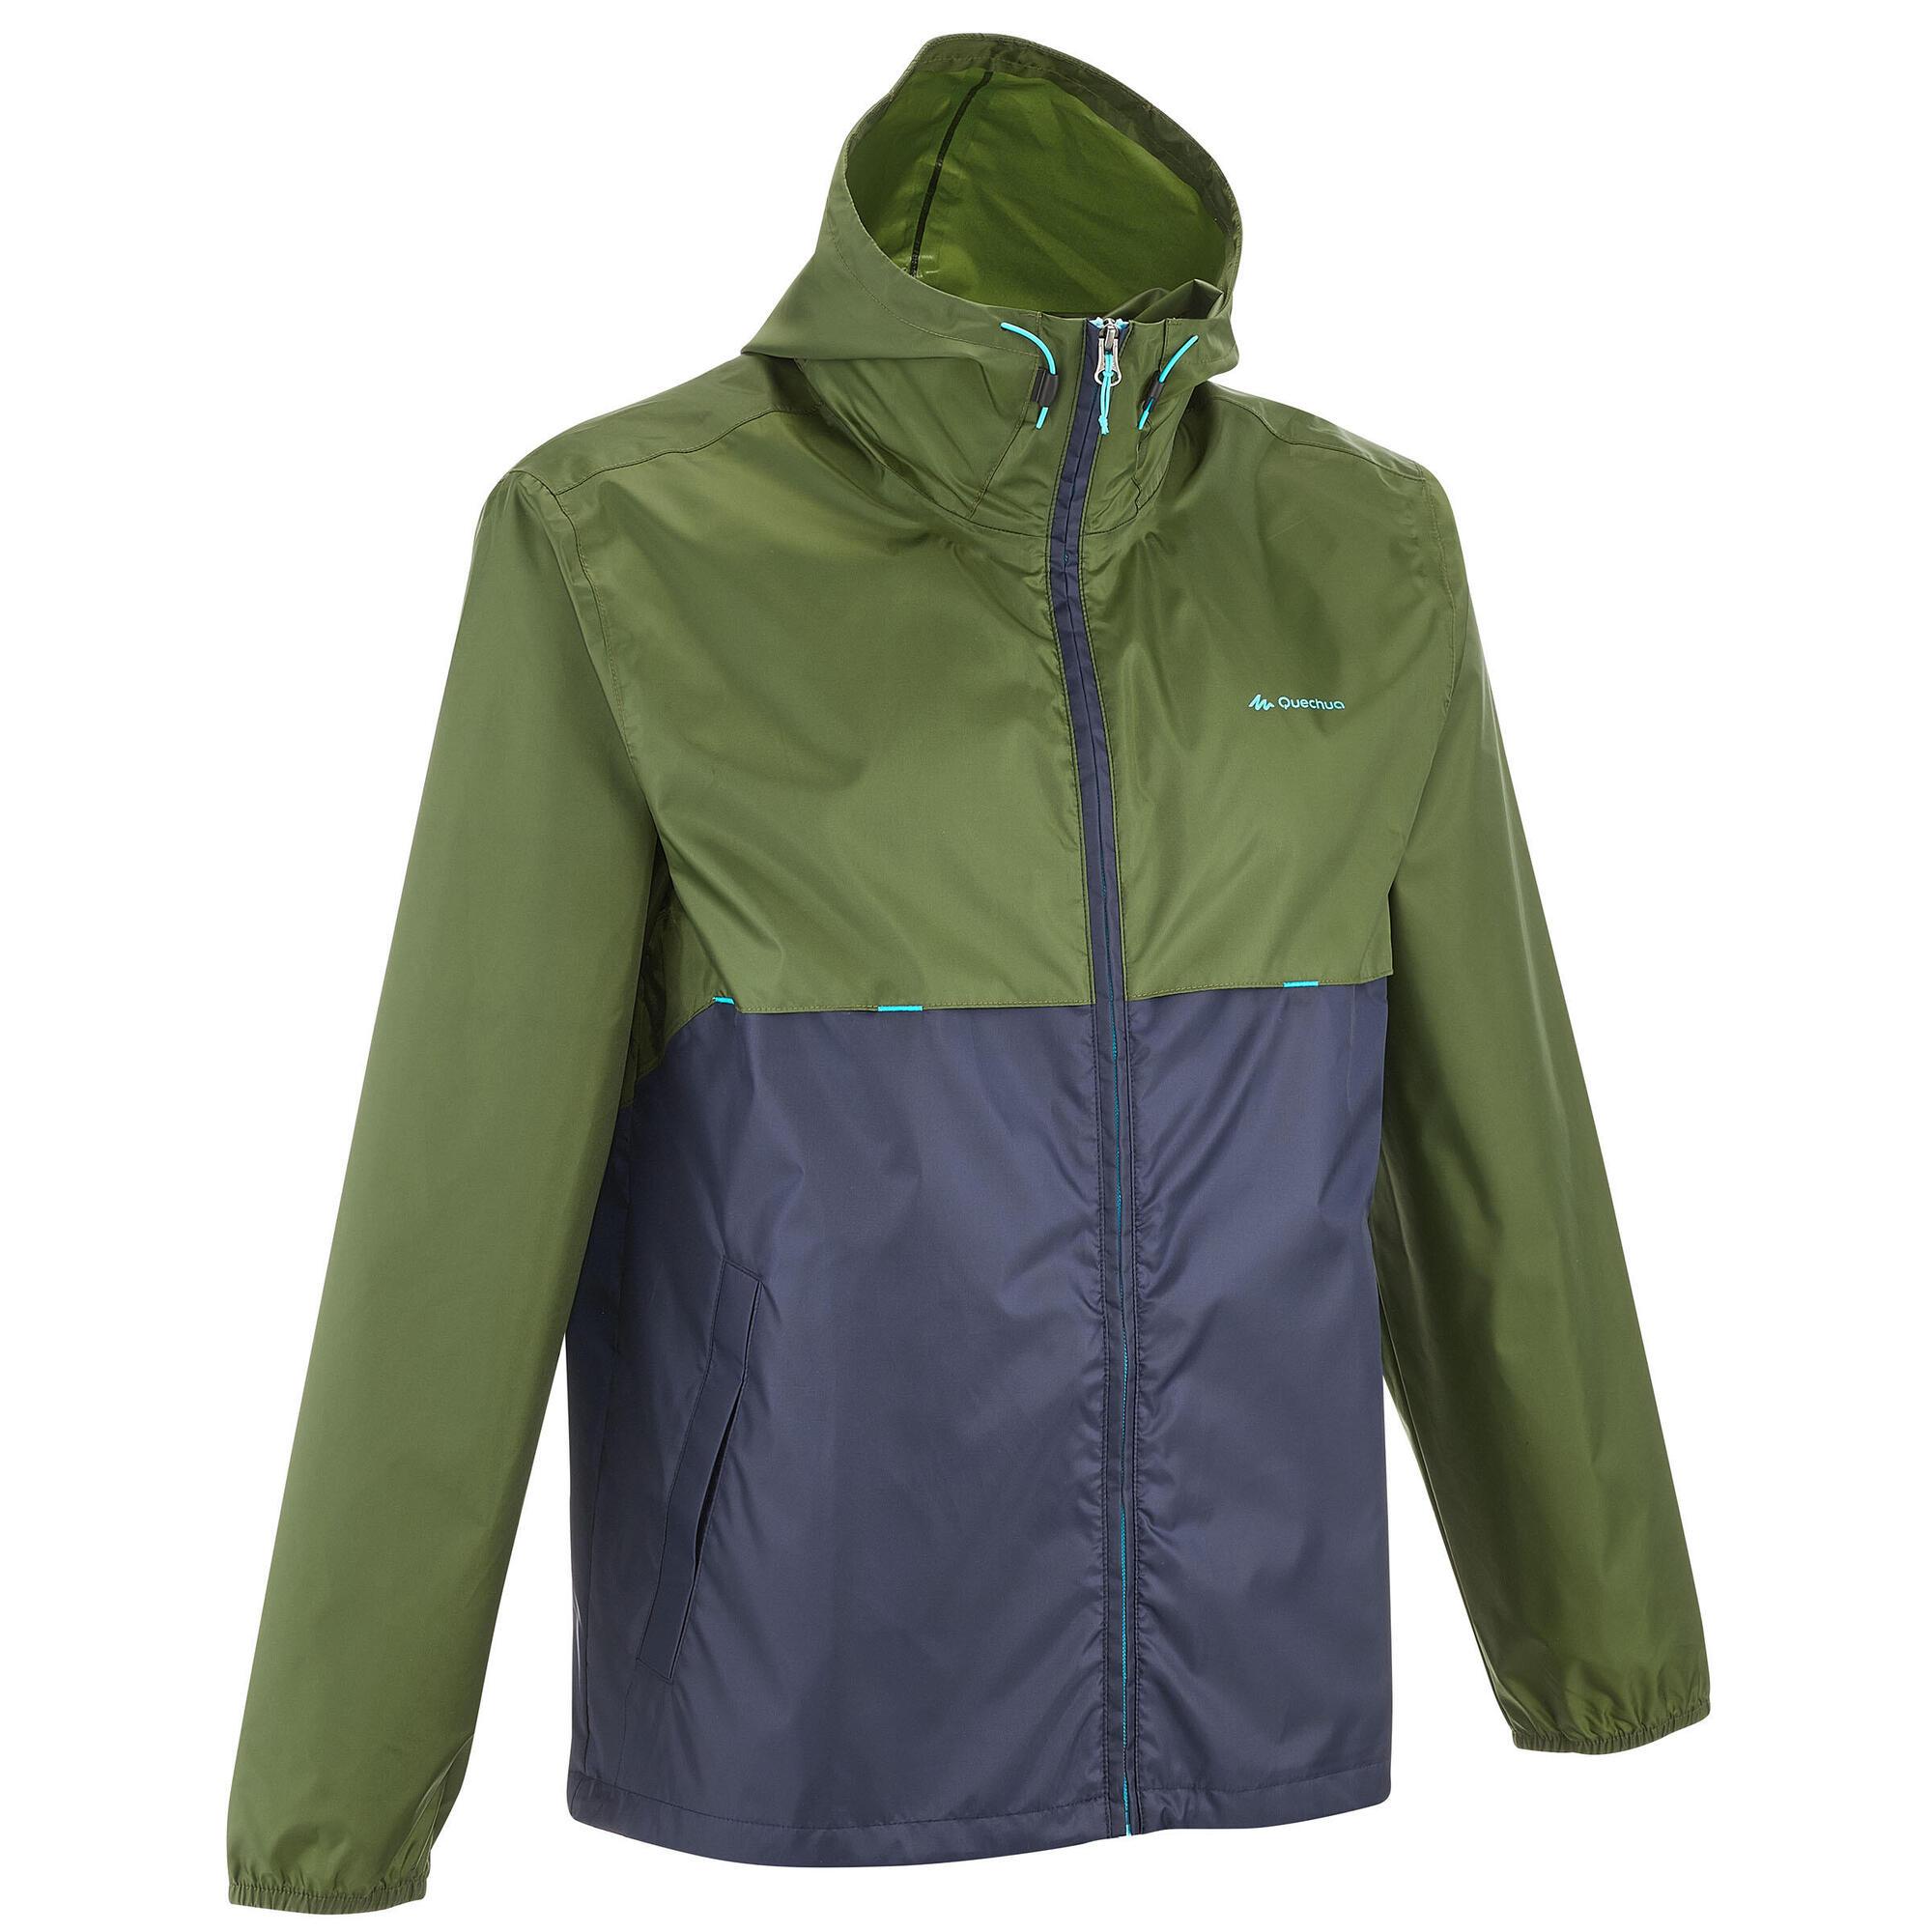 Raincut Zip Men's Waterproof Hiking Rain Jacket